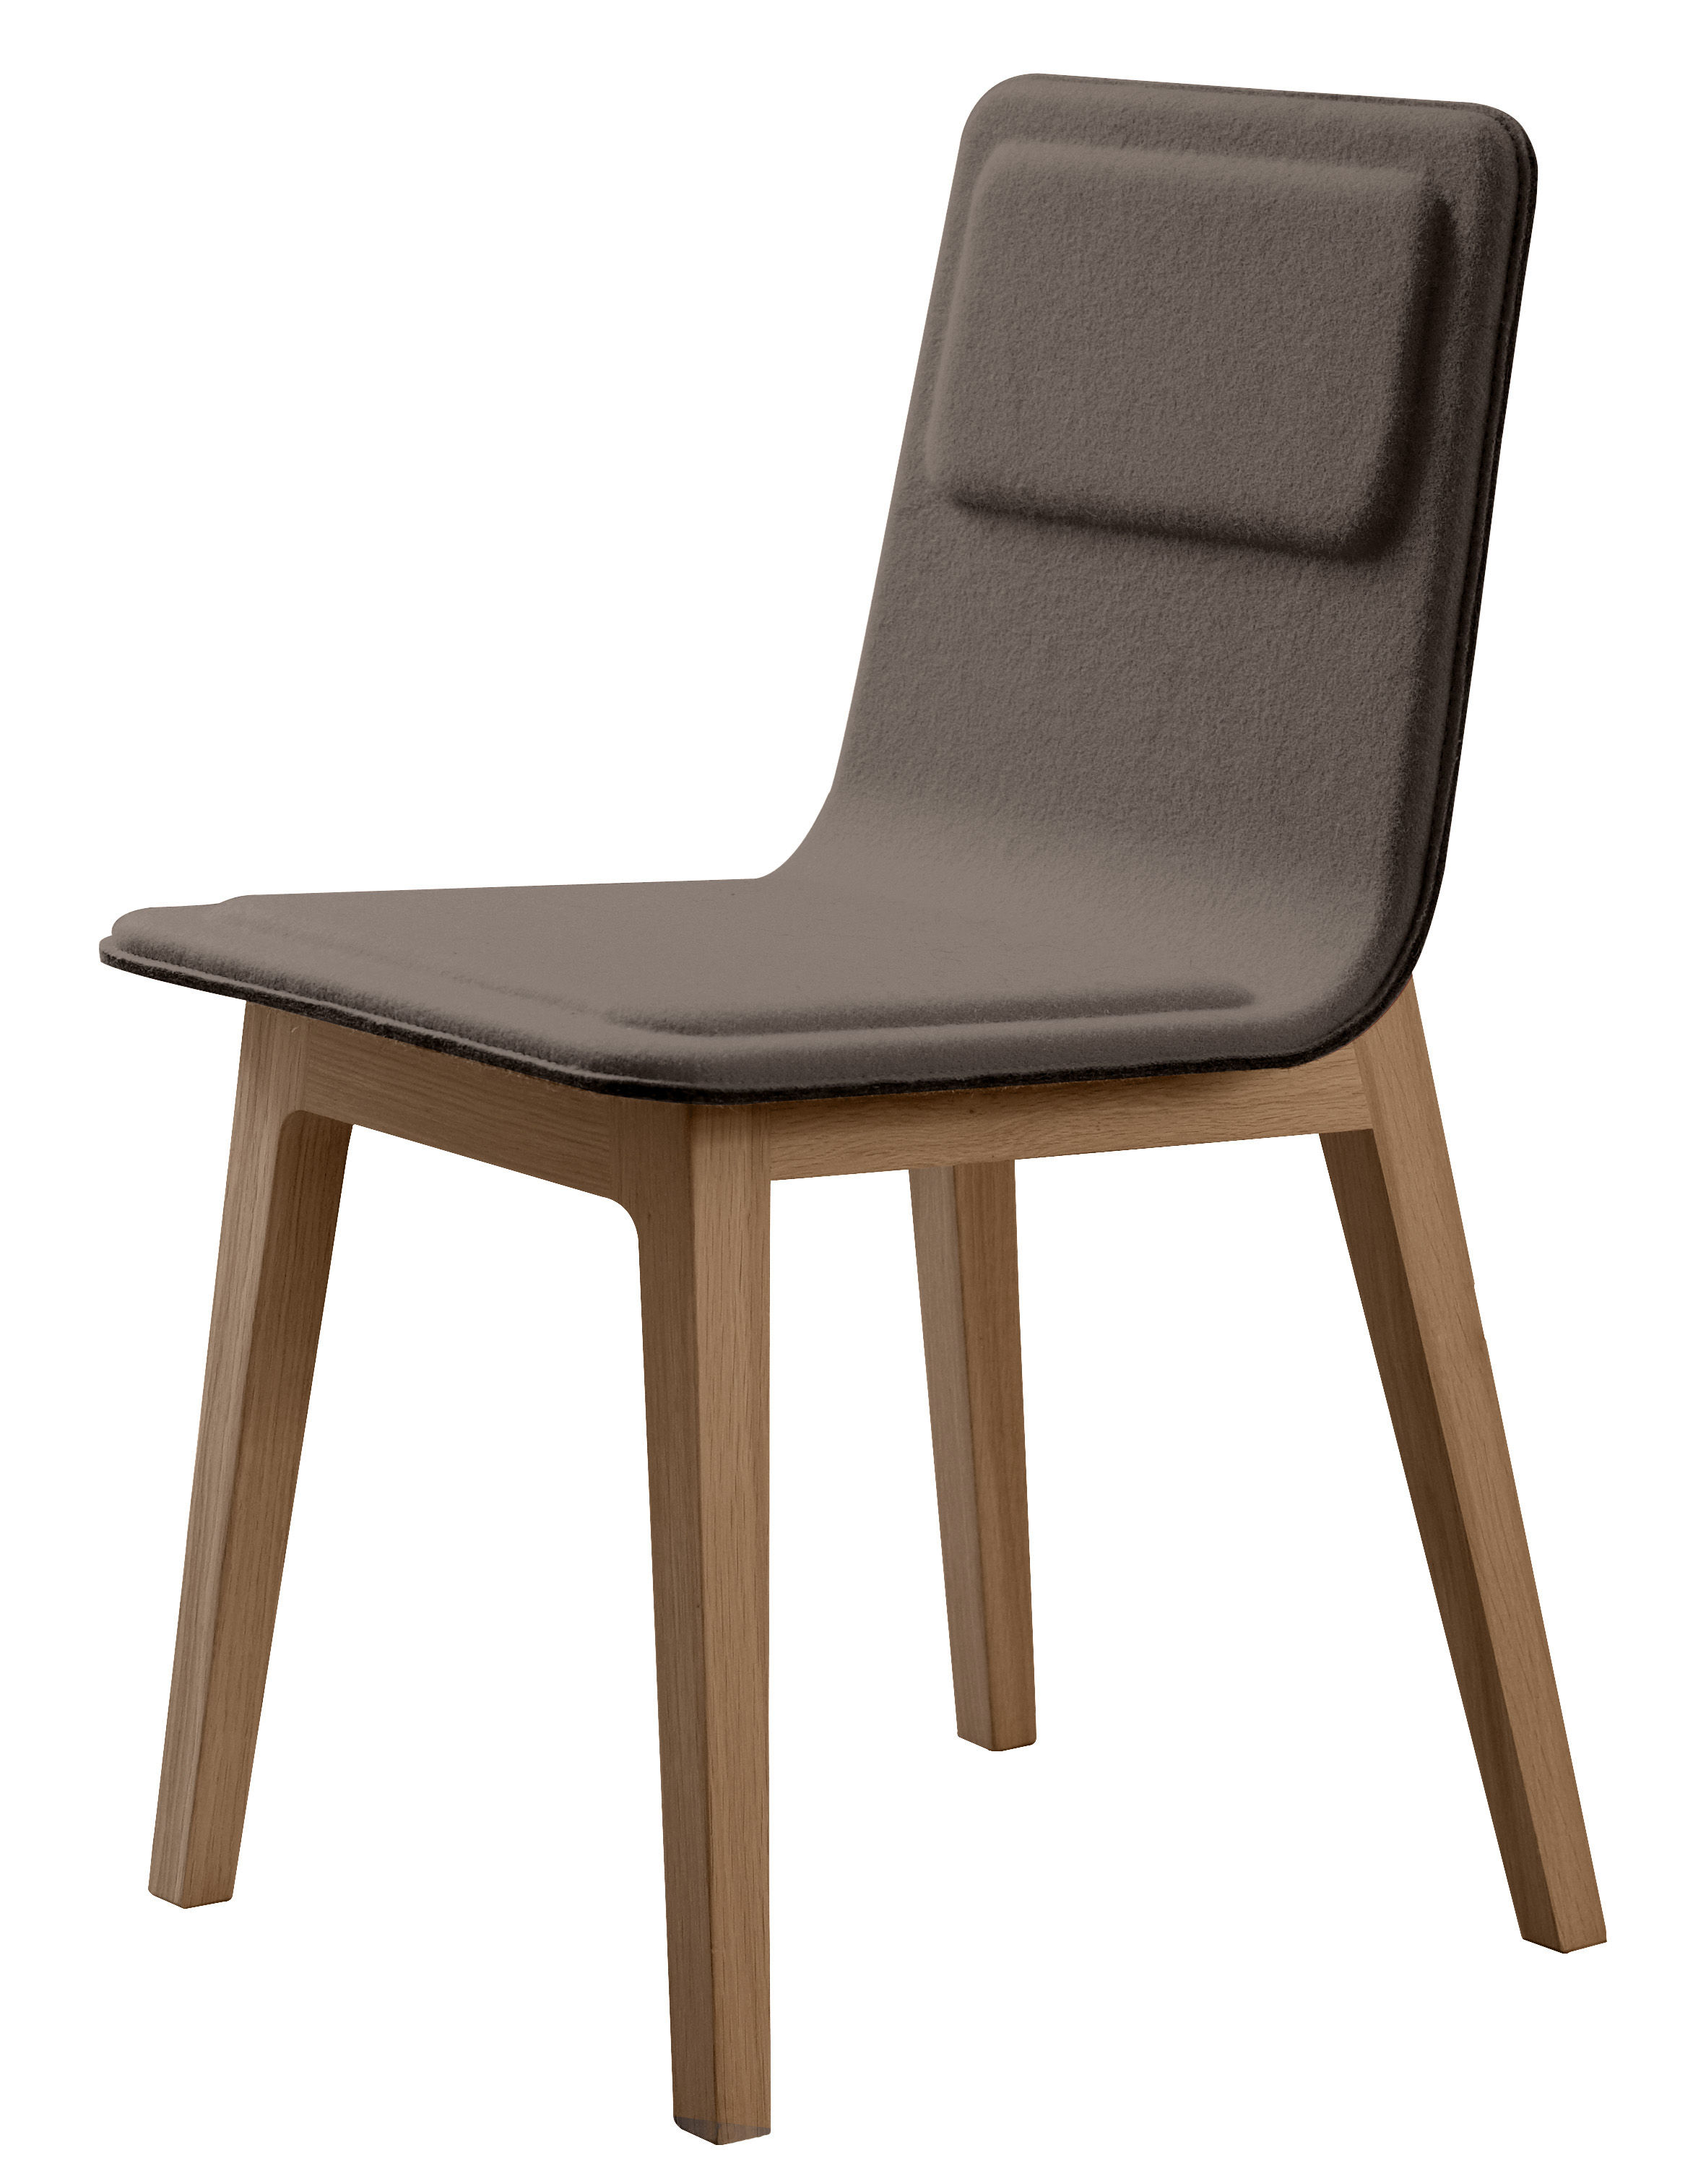 Furniture - Chairs - Laia Padded chair - Felt by Alki - Mole / Natural Oak - Beechwood plywood, Foam, Oak, Wool